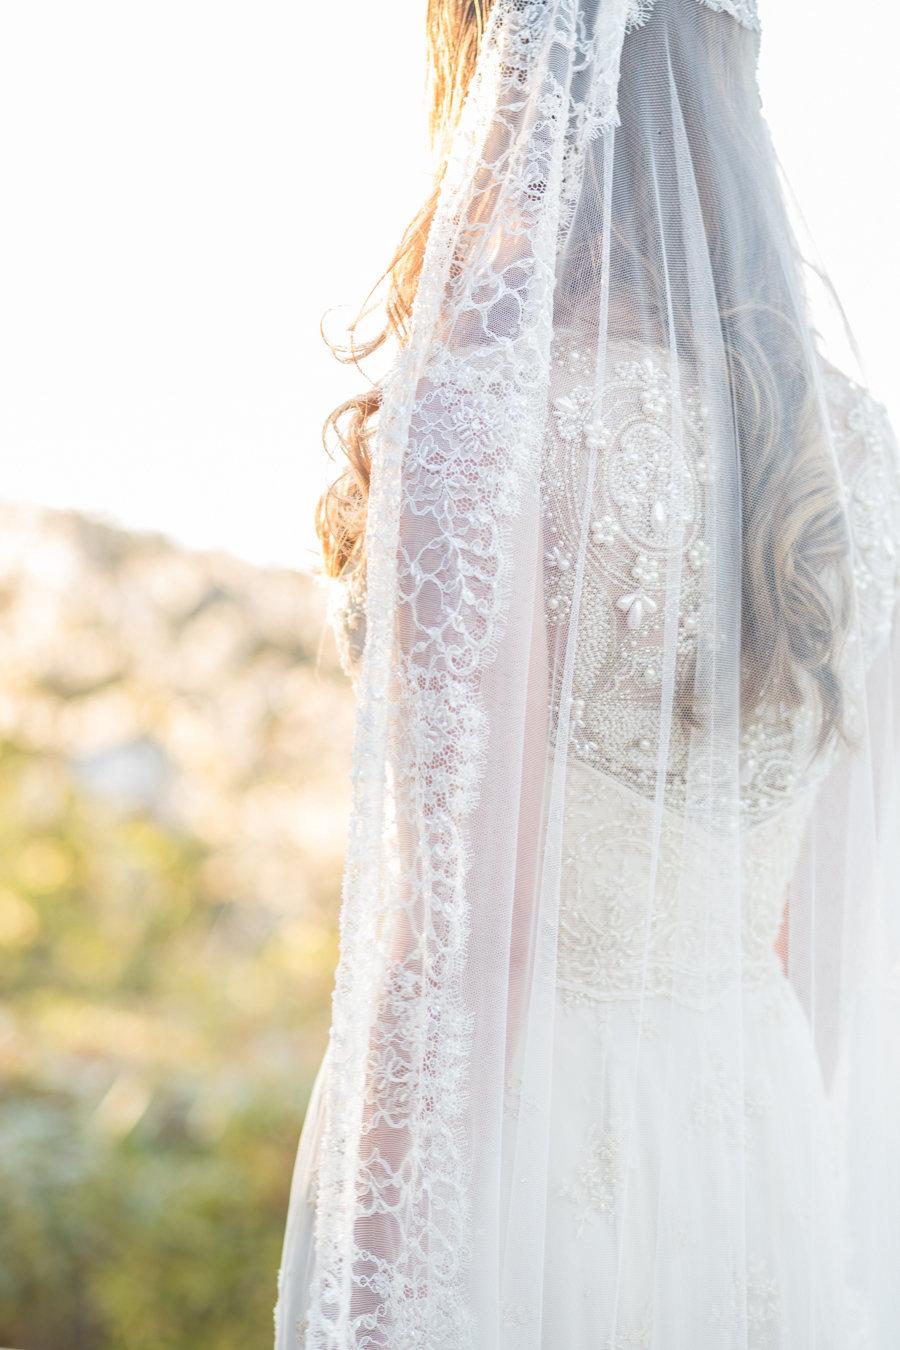 Artemis_champagne_beaded_back_lace_wedding_dress_veil_JoanneFlemingDesign_AveryLynnPhoto